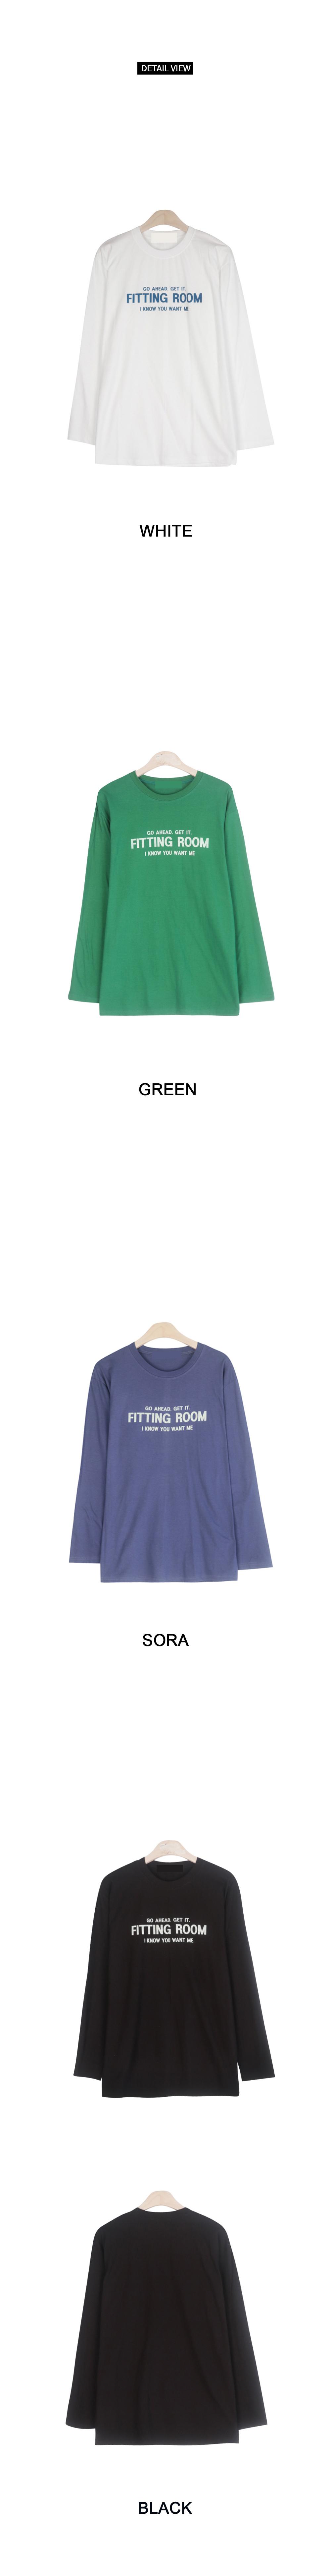 Get It Fitting Room Long Sleeve Tee